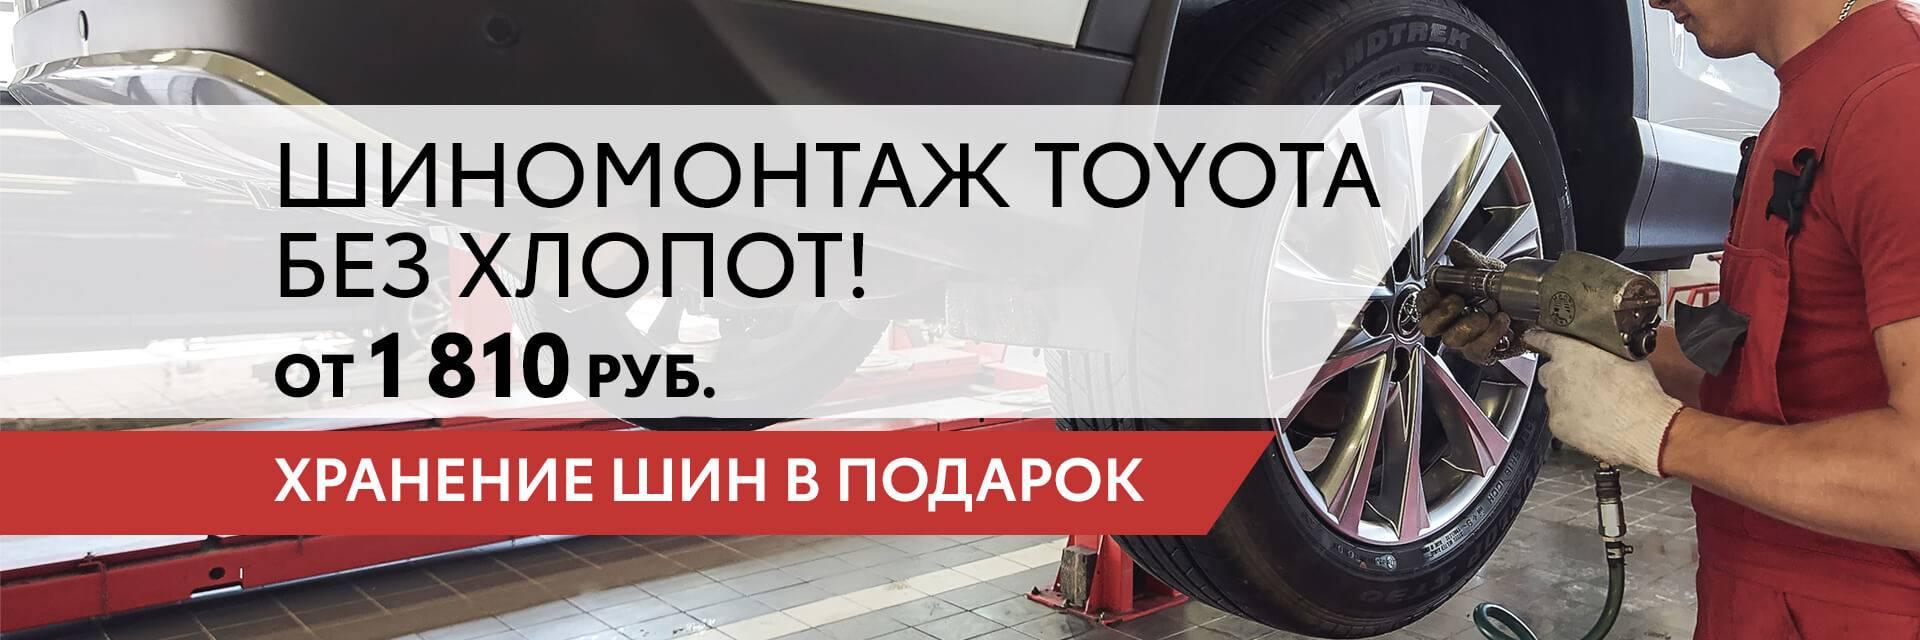 Шиномонтаж 2020 Toyota